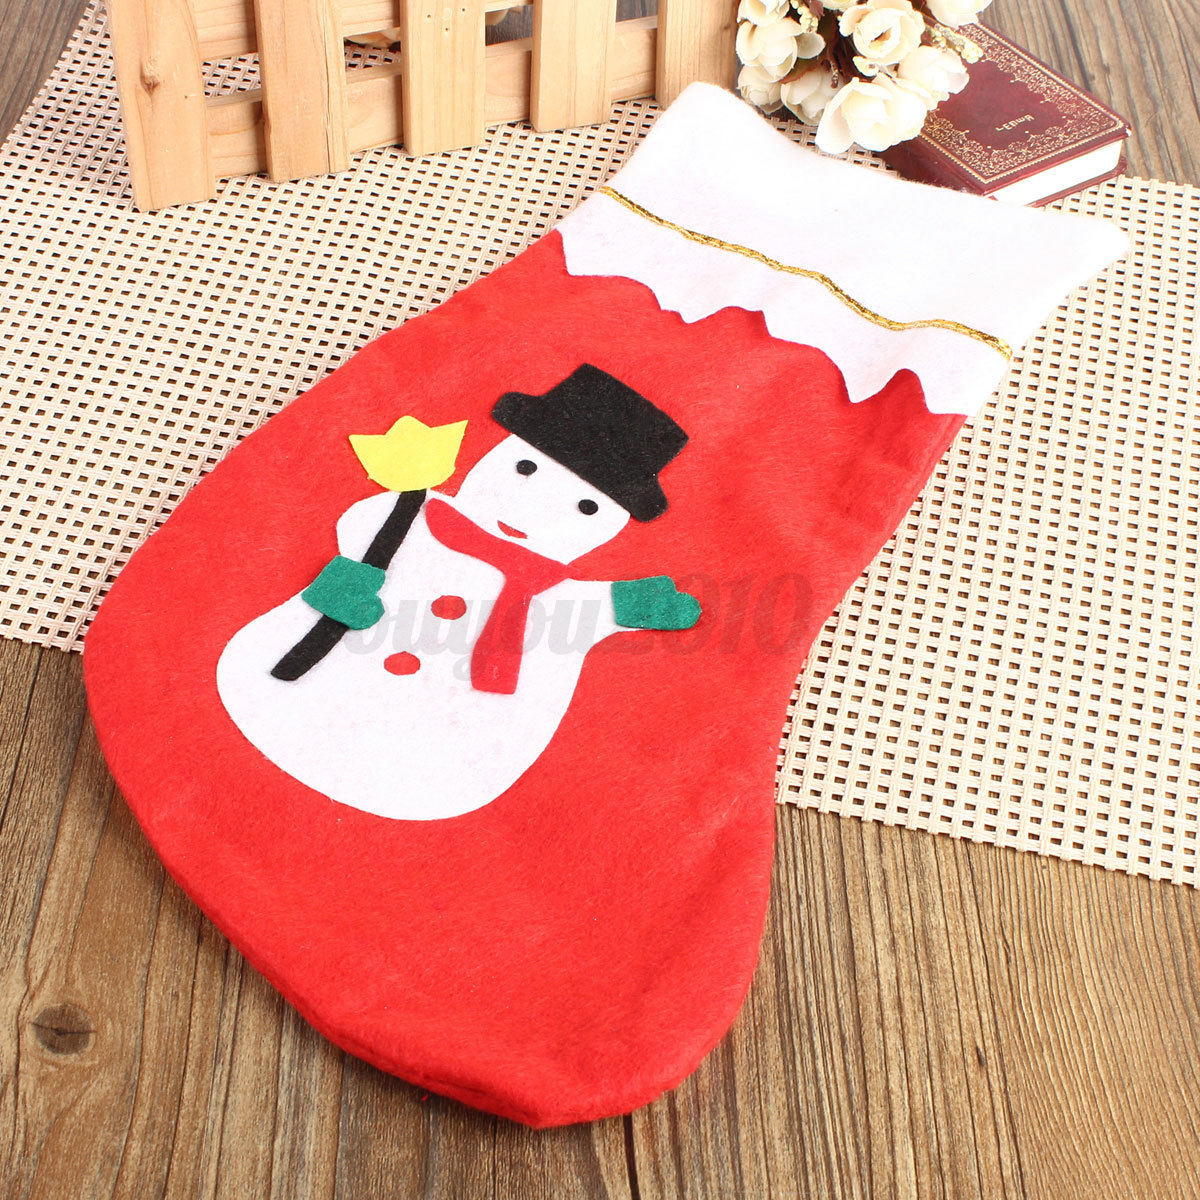 Christmas sock bas chaussette no l d corations sac cadeau sapin d cor f te ebay - Cadeau de noel a vendre ...